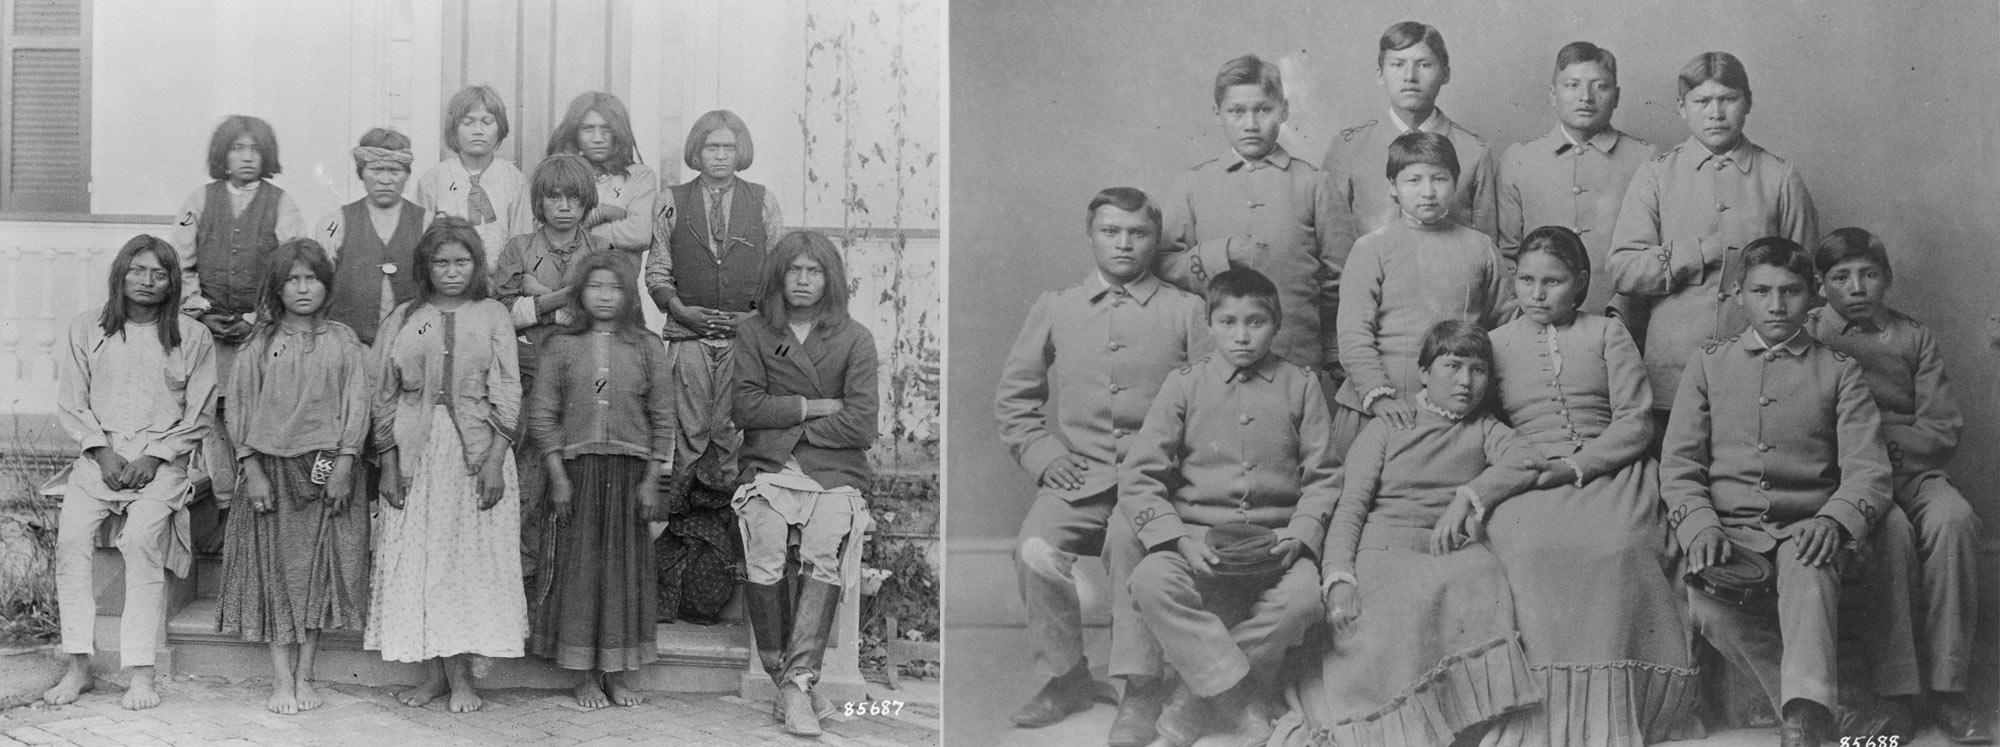 Chiracahua Apache Students at Carlisle Indian School